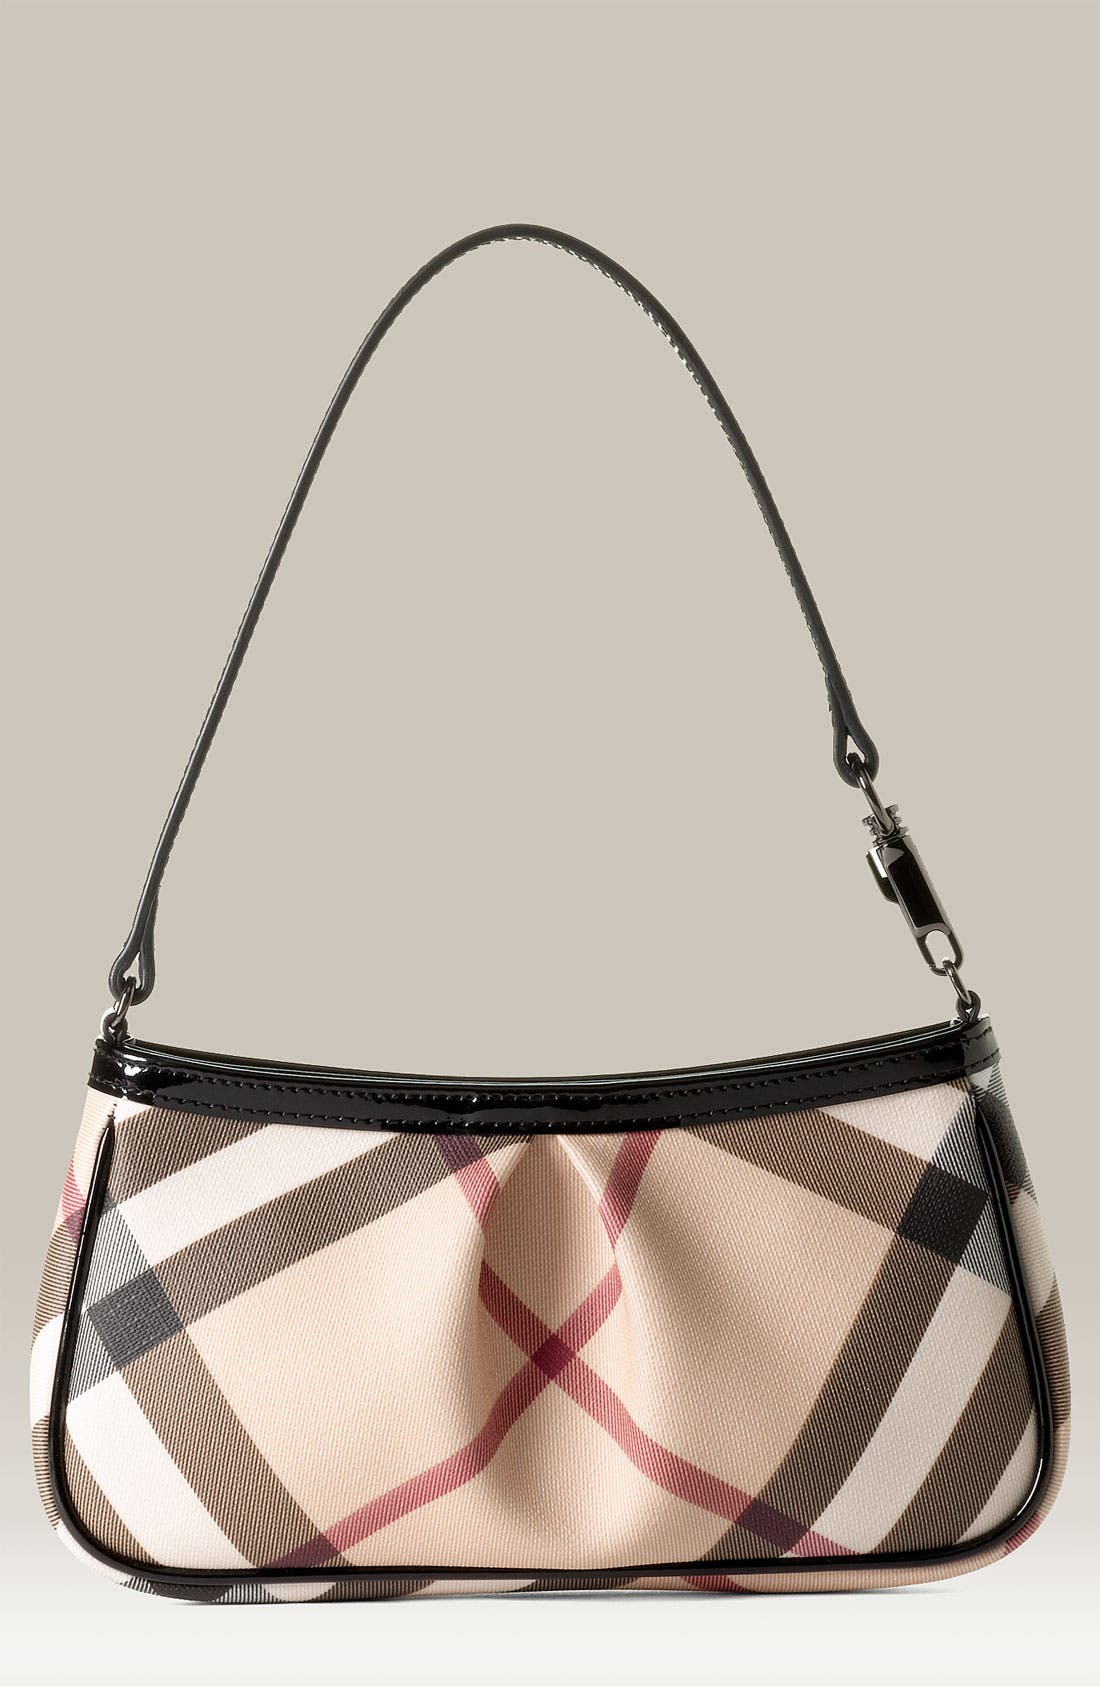 'Nova Check' Mini Shoulder Bag,                             Main thumbnail 1, color,                             250